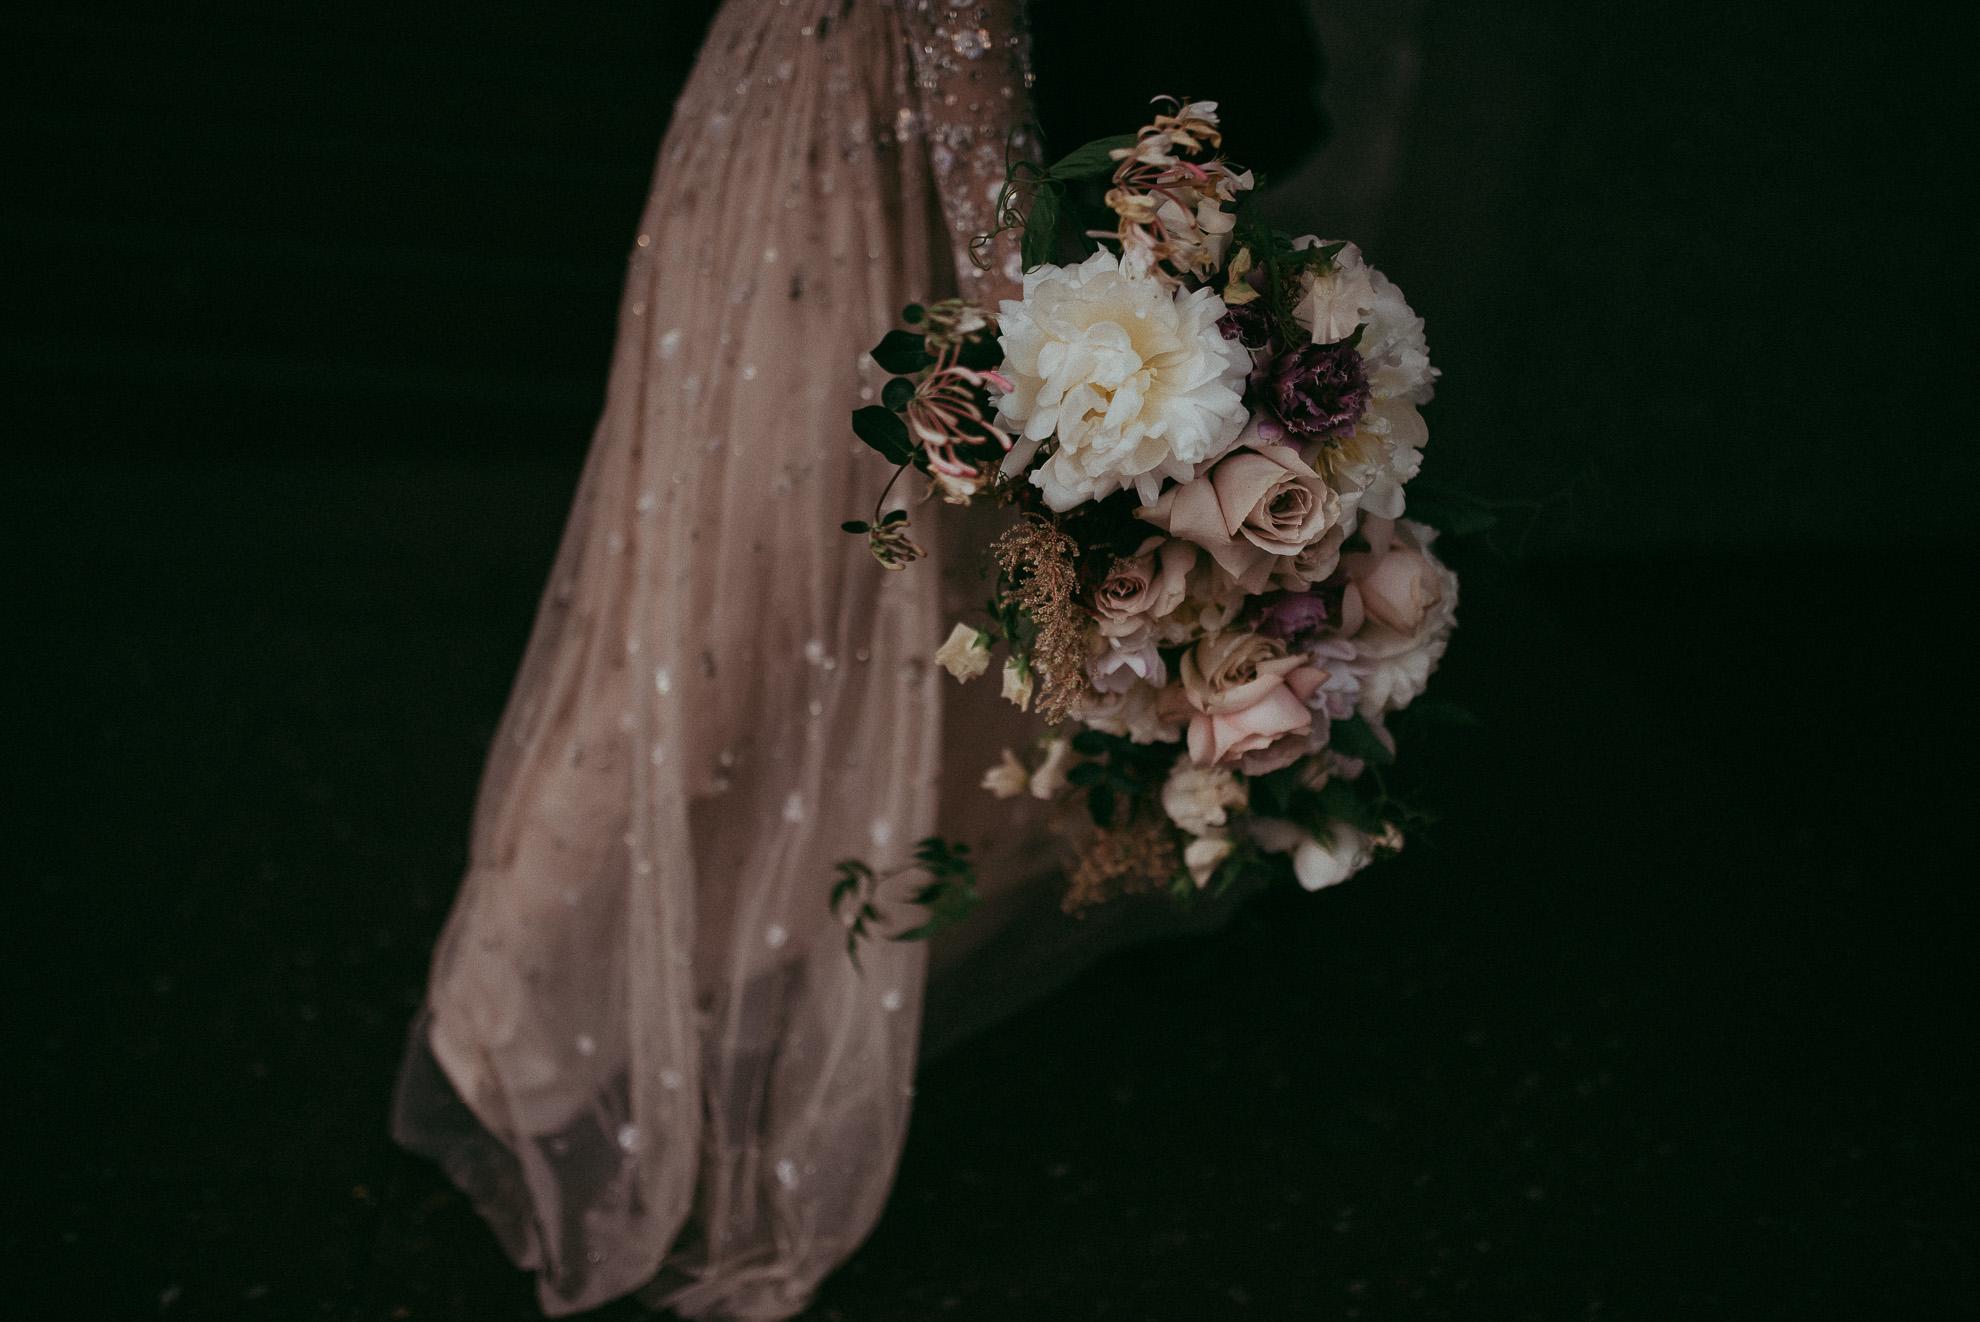 Auckland City - Hotel DeBrett Wedding-Elopement {New Zealand weddings photographer}